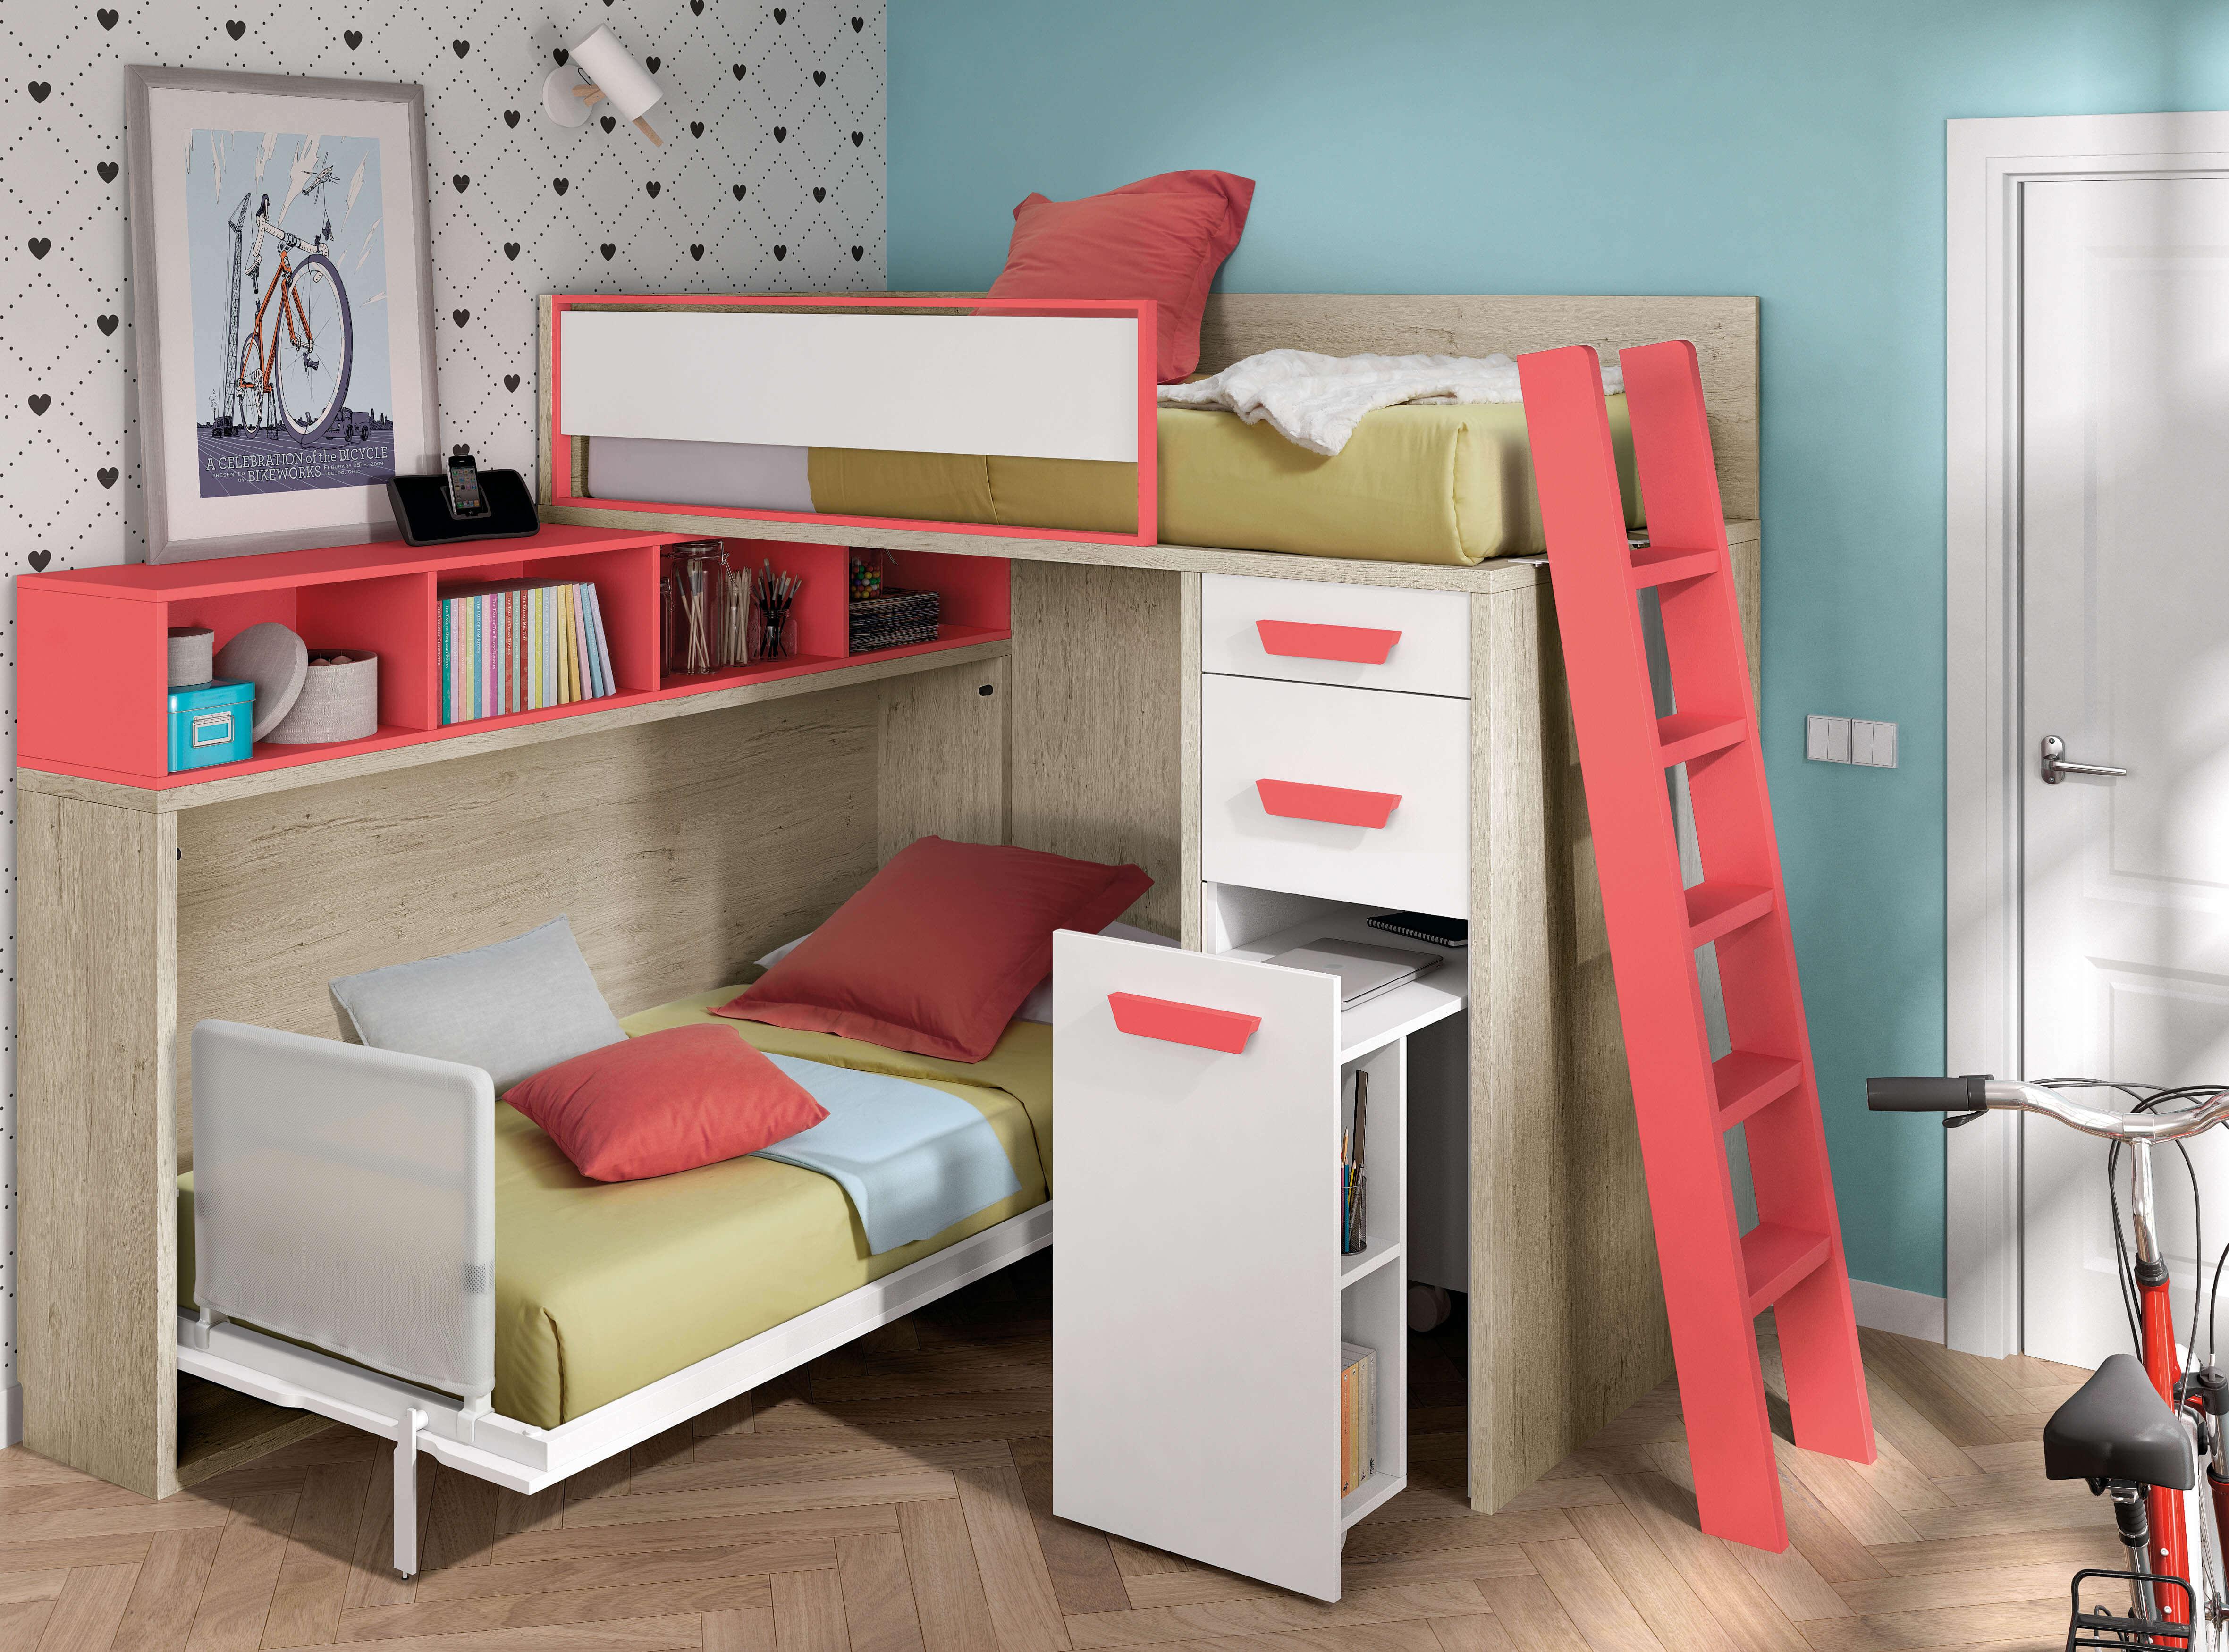 Camas abatibles horizontales cama plegable camas abatibles - Camas plegables horizontales ...